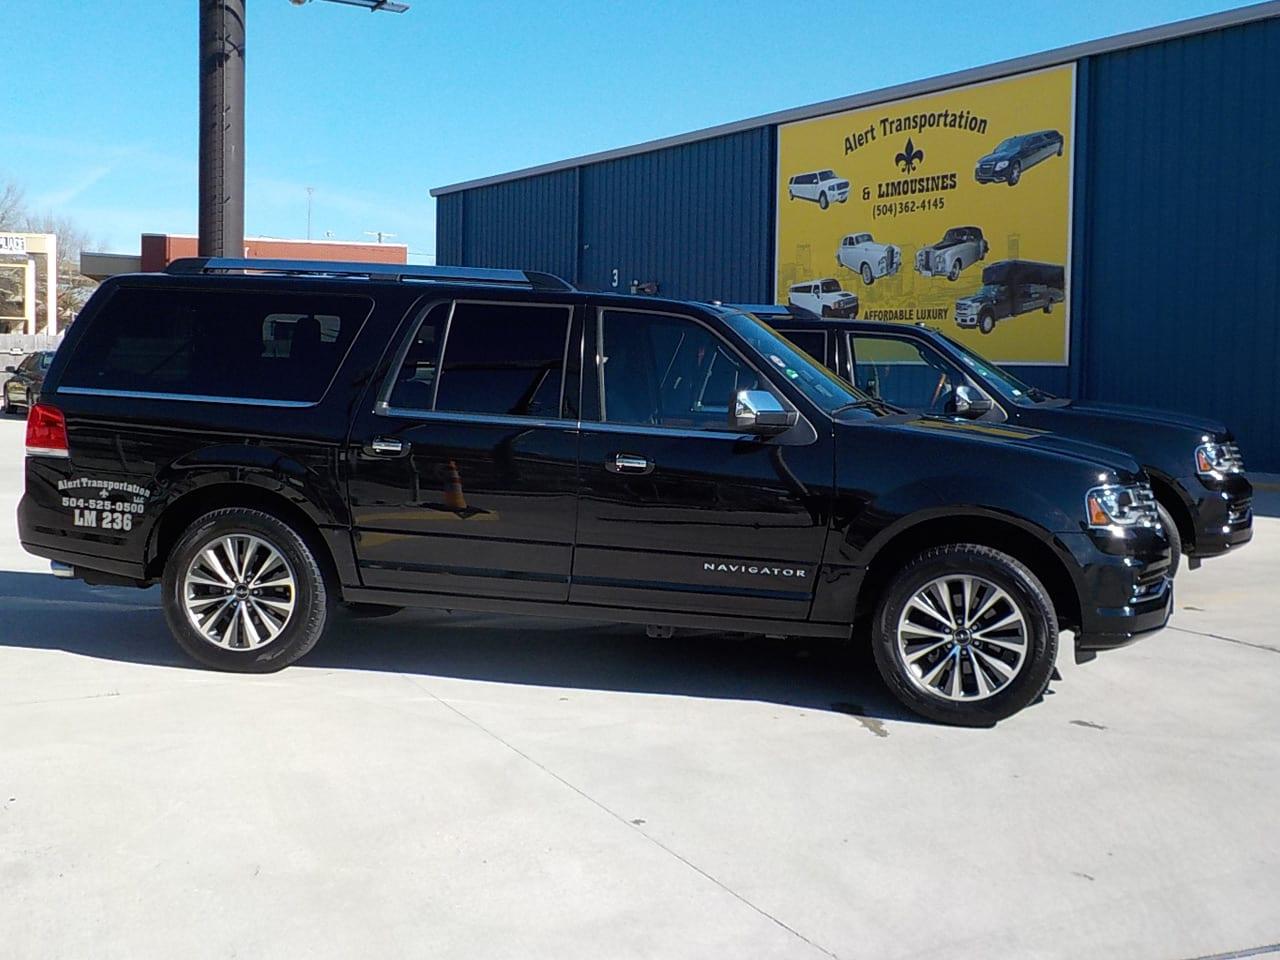 Black 2016 Lincoln Navigator Passengers: 5 Amenities: Leather Seat